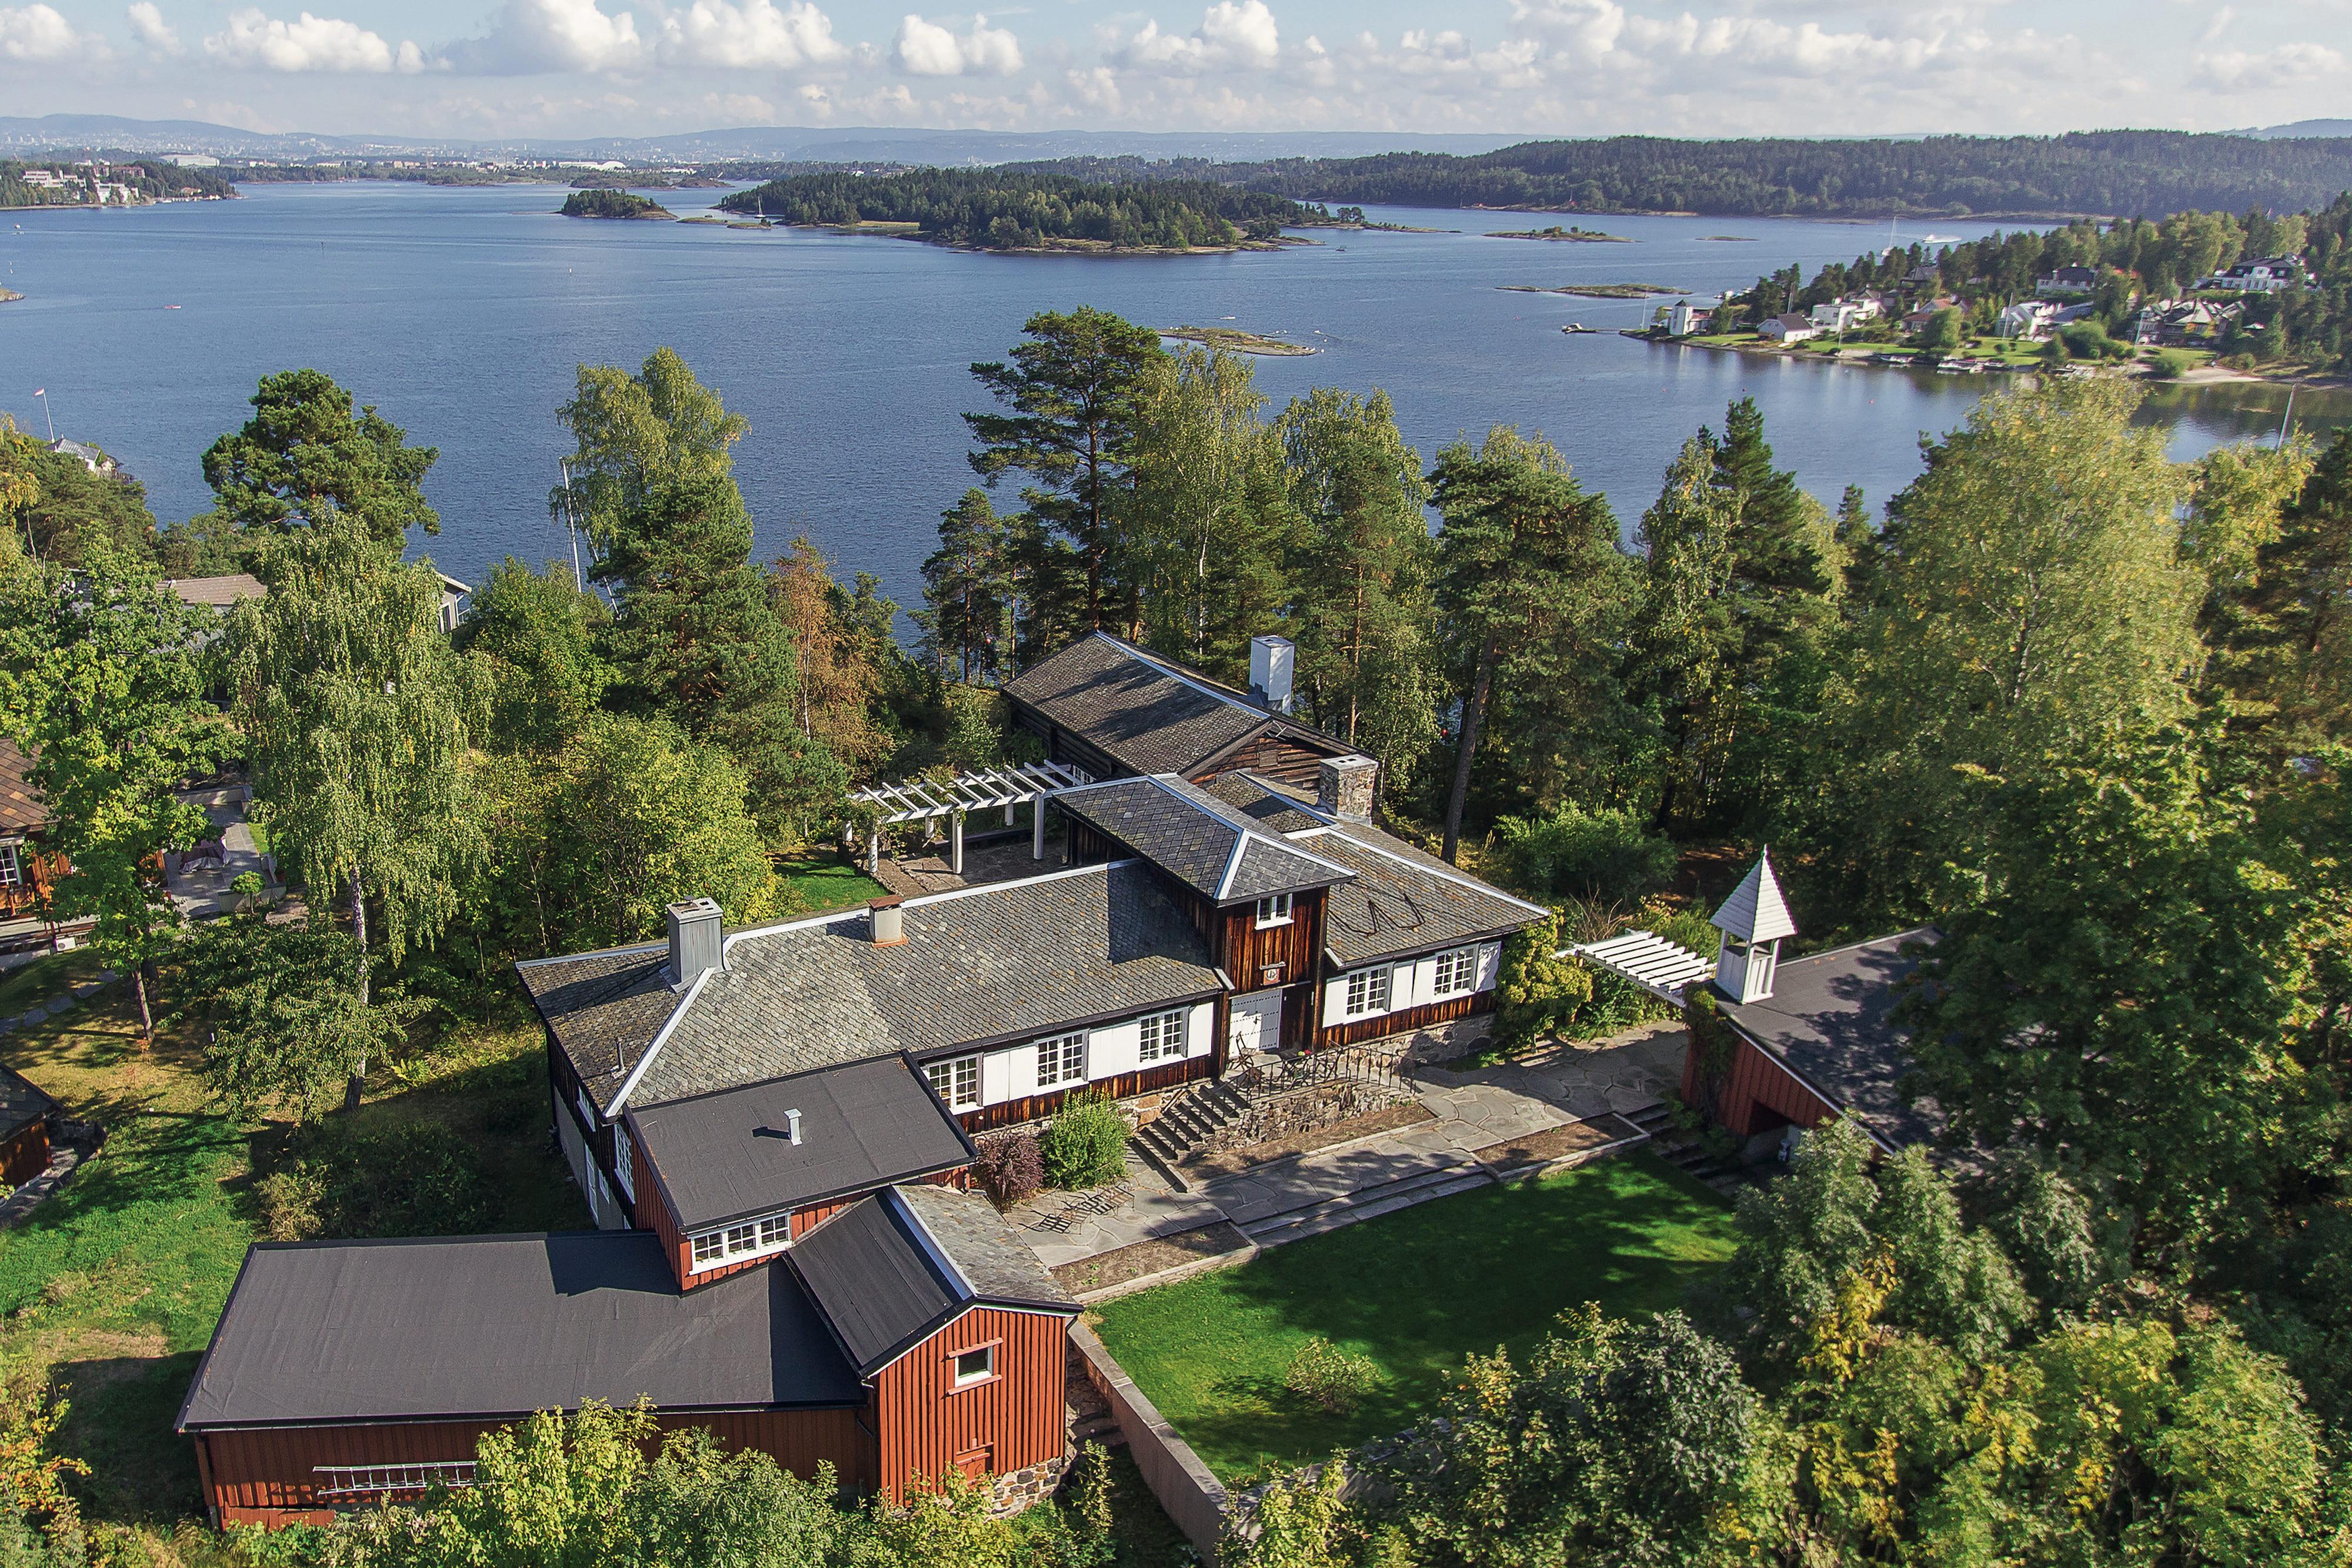 Herrodd - Poulssons eget hjem på Nesøya.